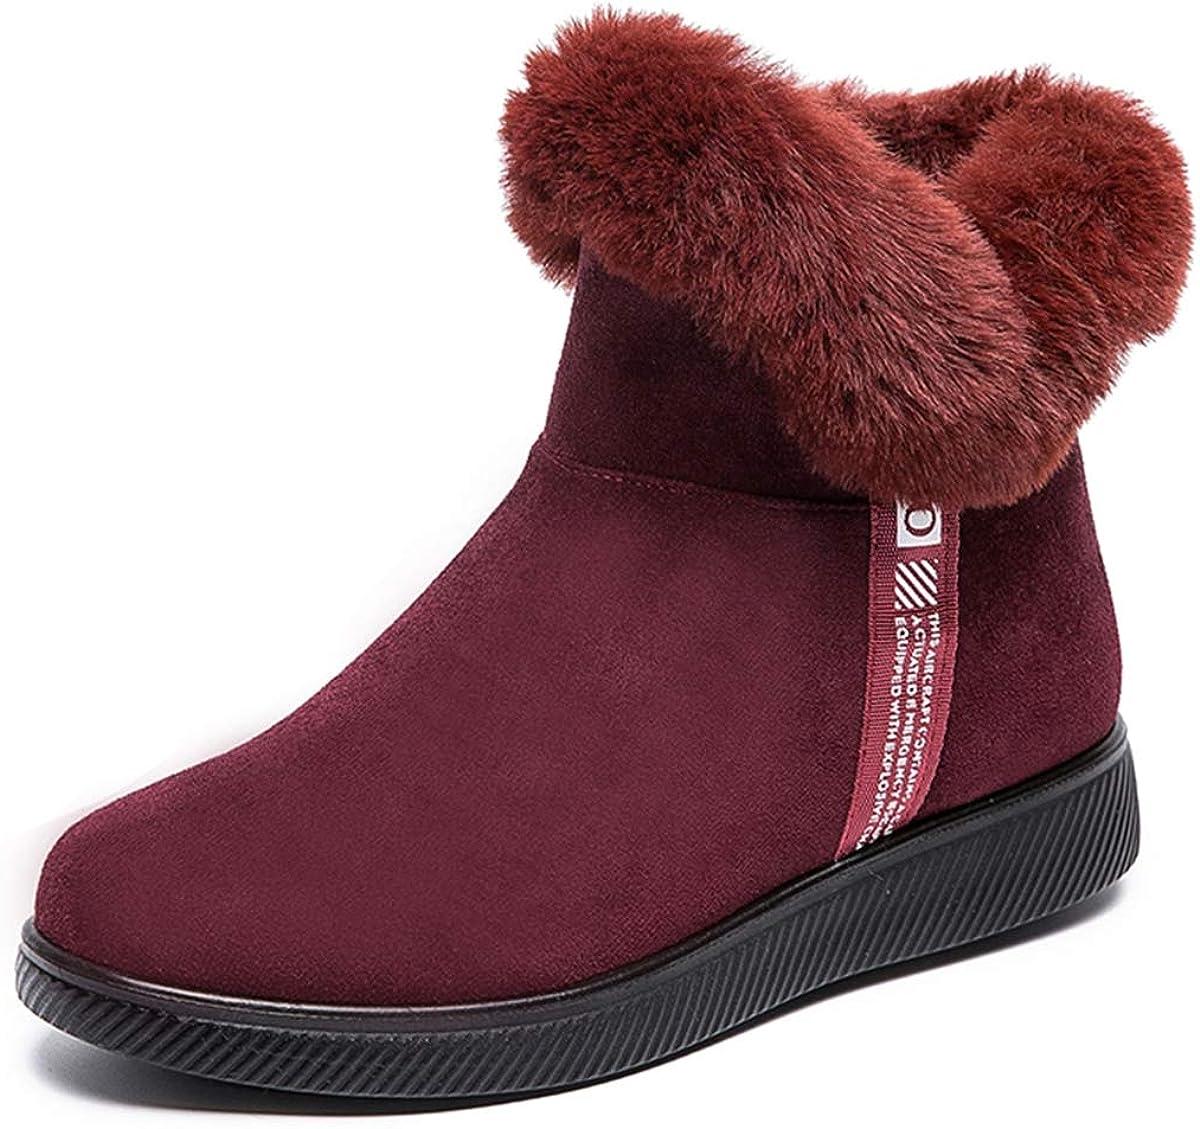 Waterproof Winter Women Flat Shoes Snow Boots Fur-lined Slip On Warm Ankle Size